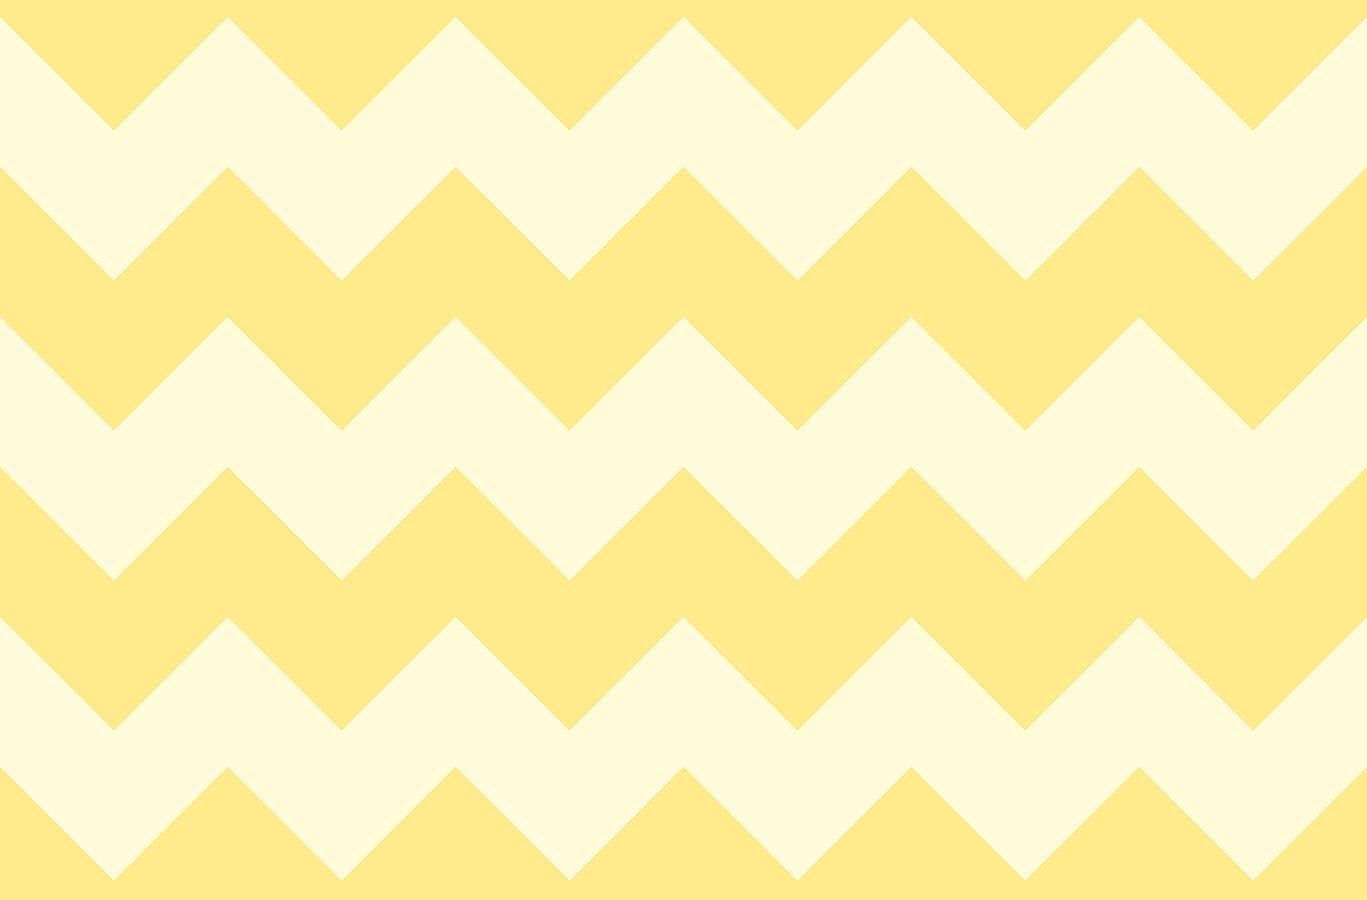 vf203ye2_chevron_stripe_yellow